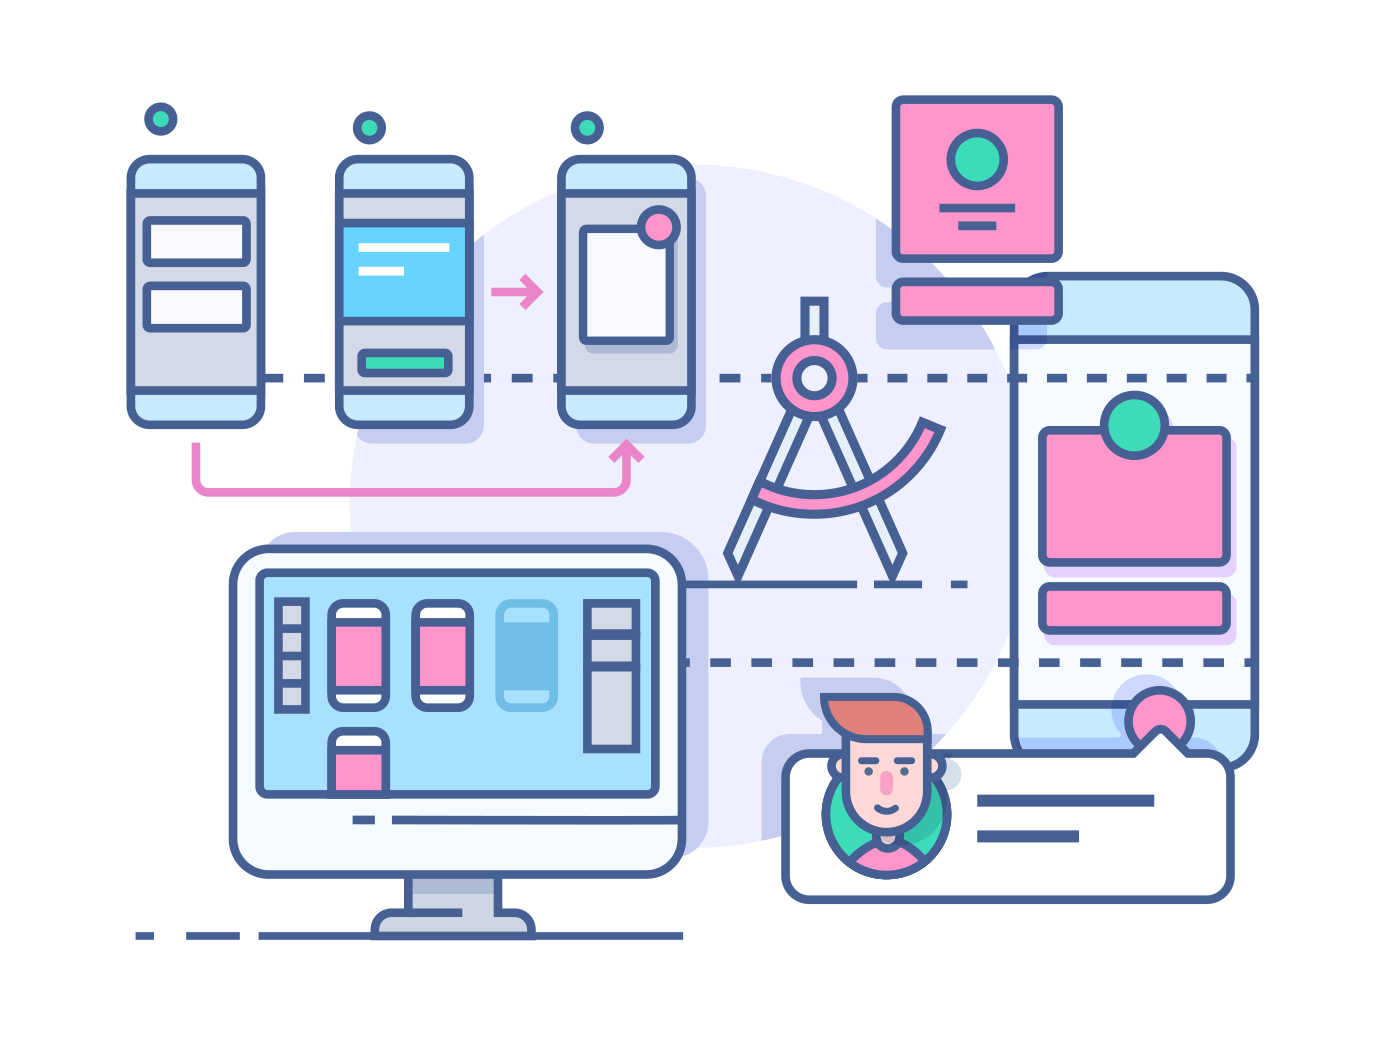 UX UI design process line vector illustration